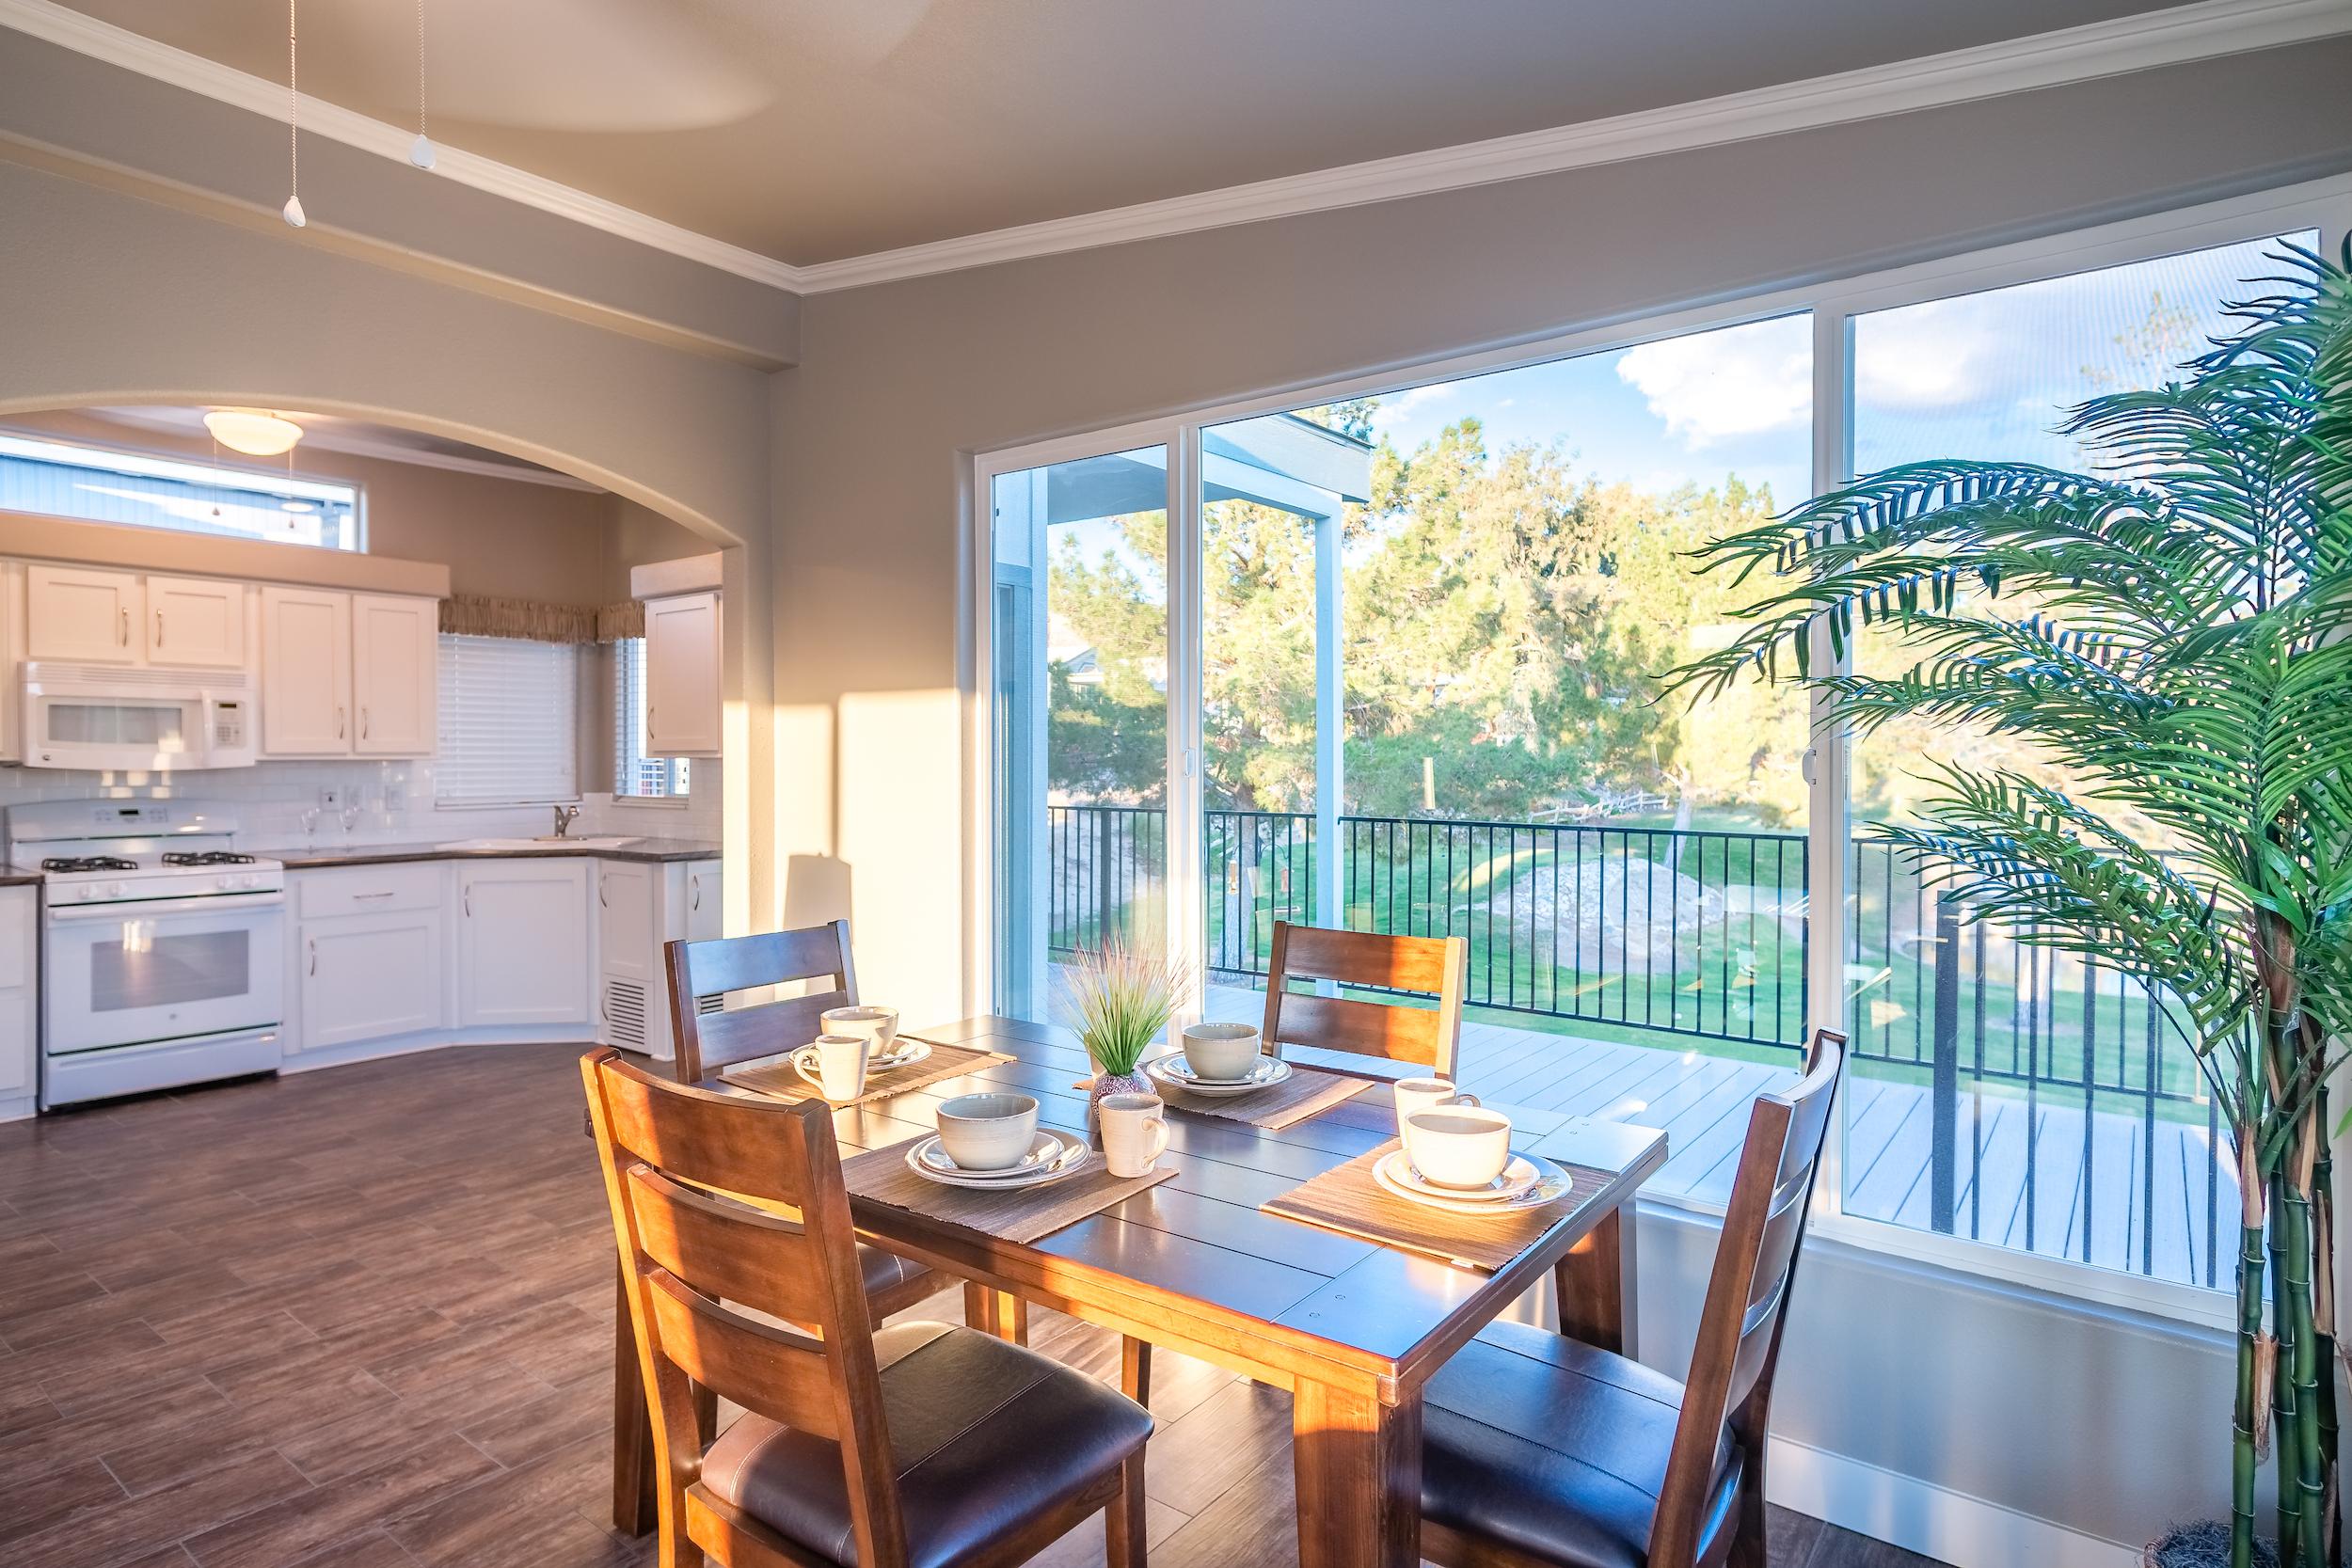 modern-kithen-dining-area-view.jpg